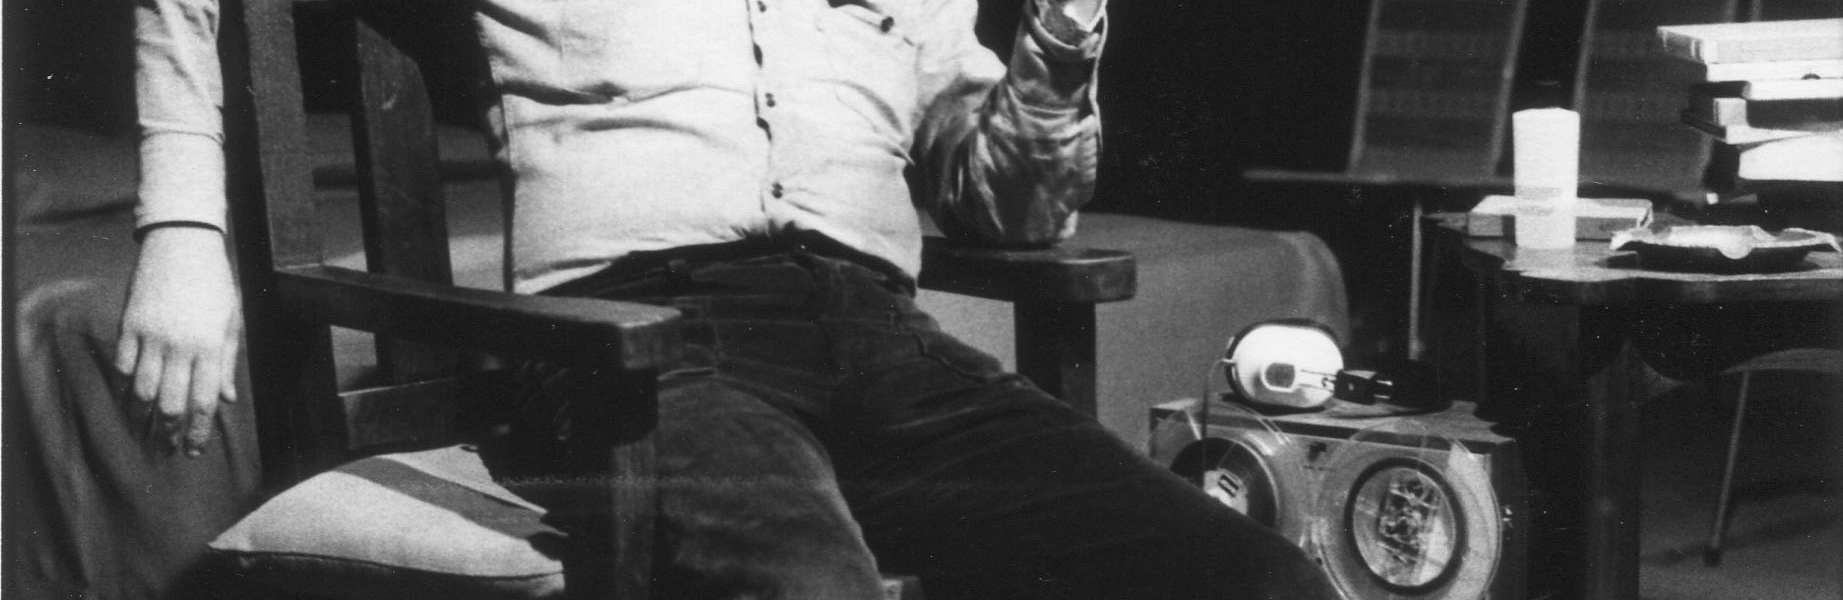 Jose Ignacio Cabrujas. Fotografo Ricardo Armas. 1975